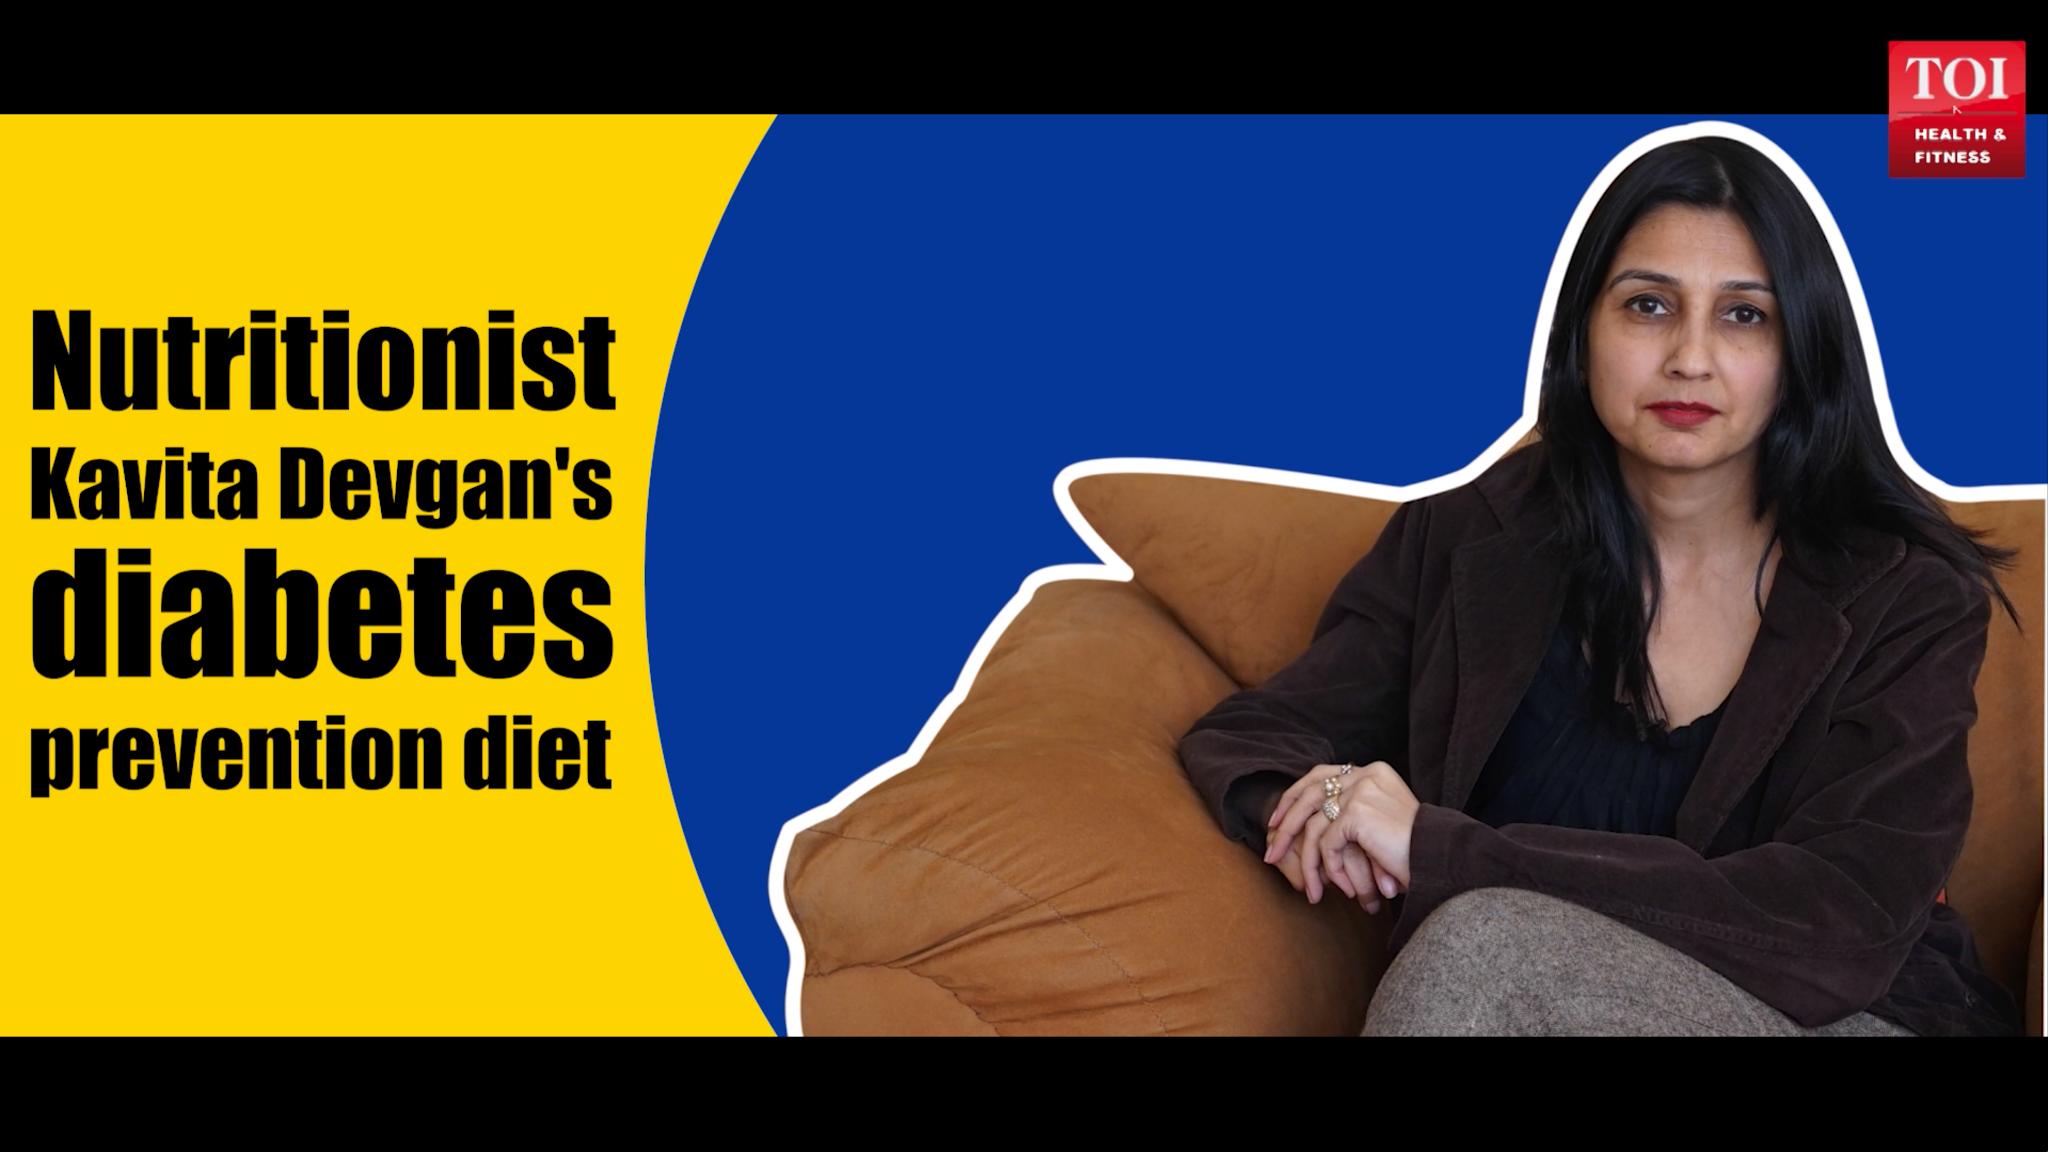 nutritionist-kavita-devgans-diabetes-prevention-diet